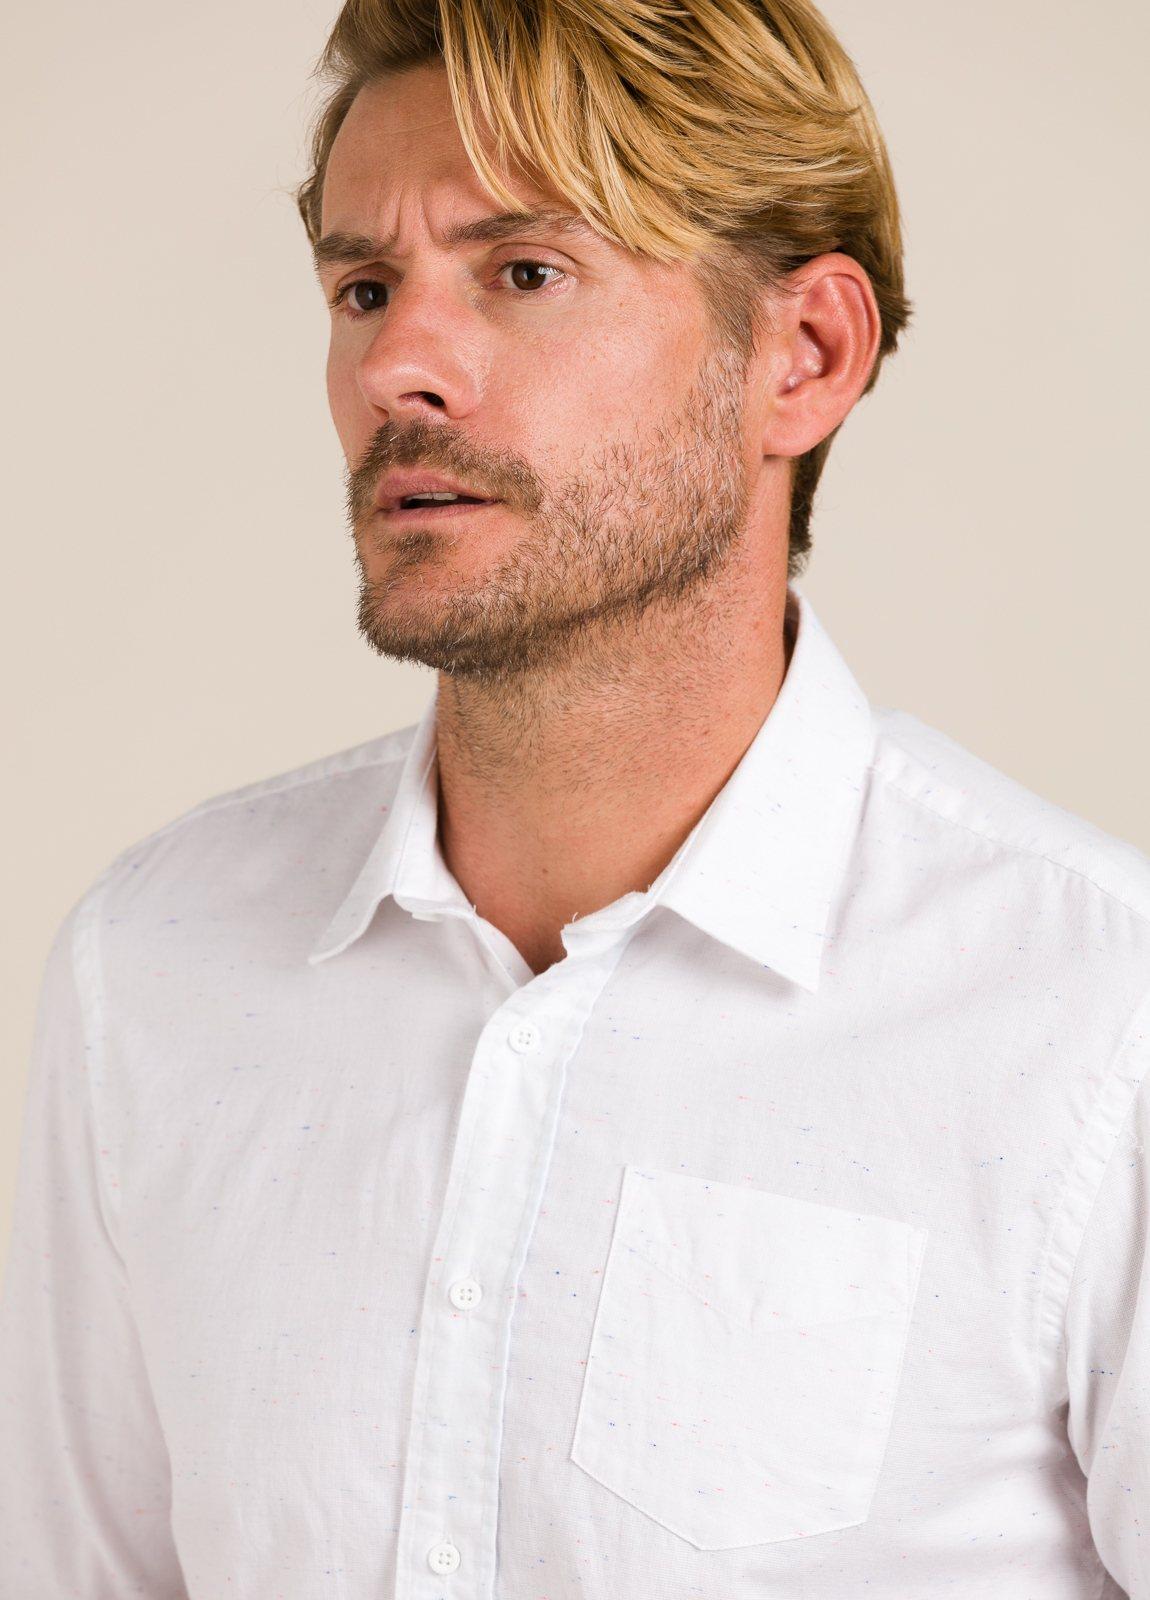 Camisa SCOTCH & SODA blanca. - Ítem3